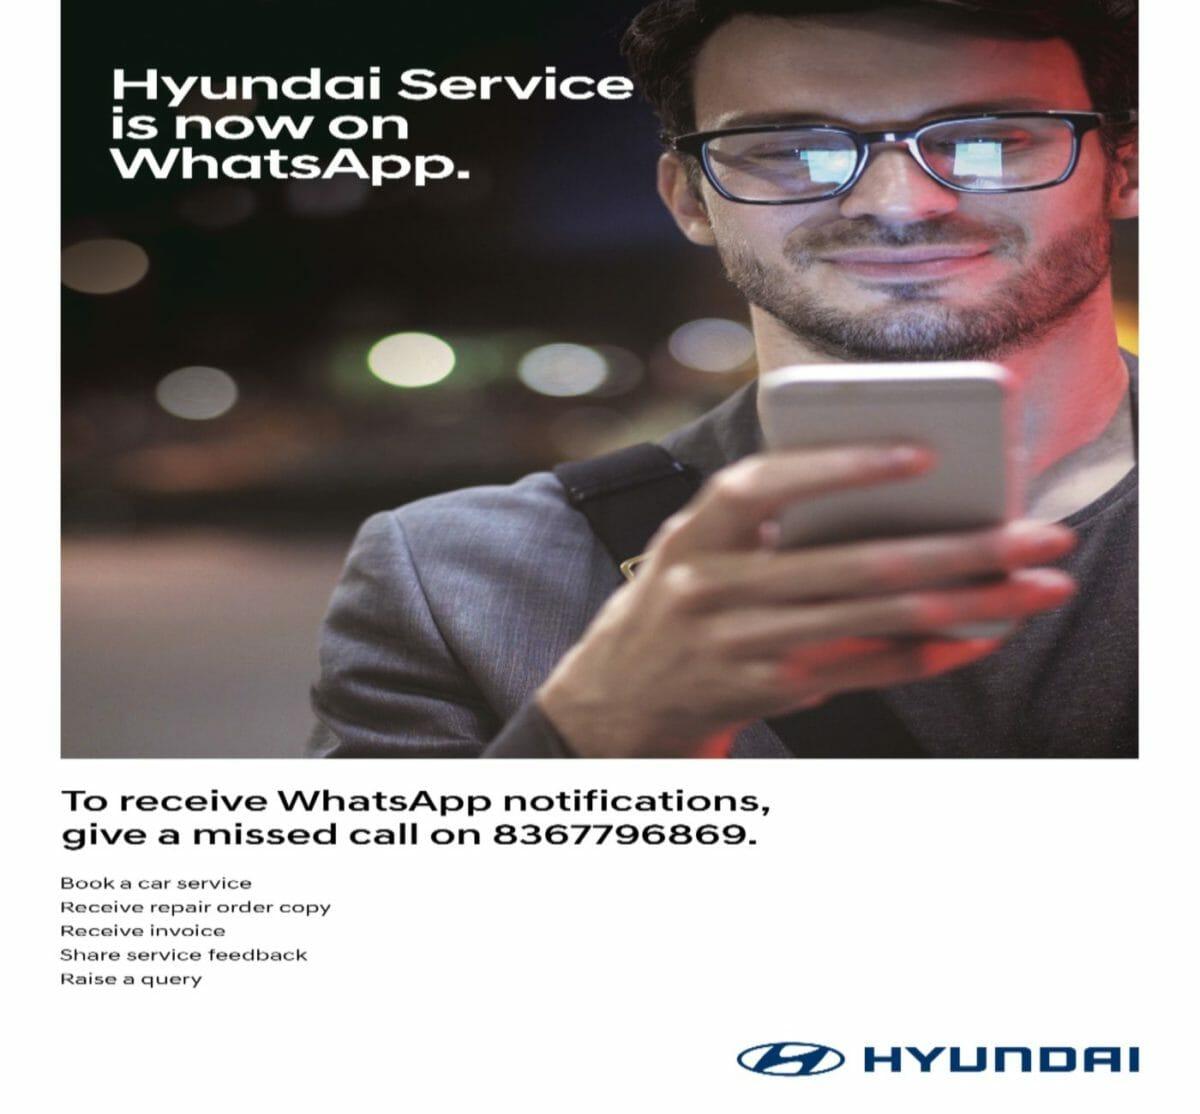 Hyundai service on whatsapp